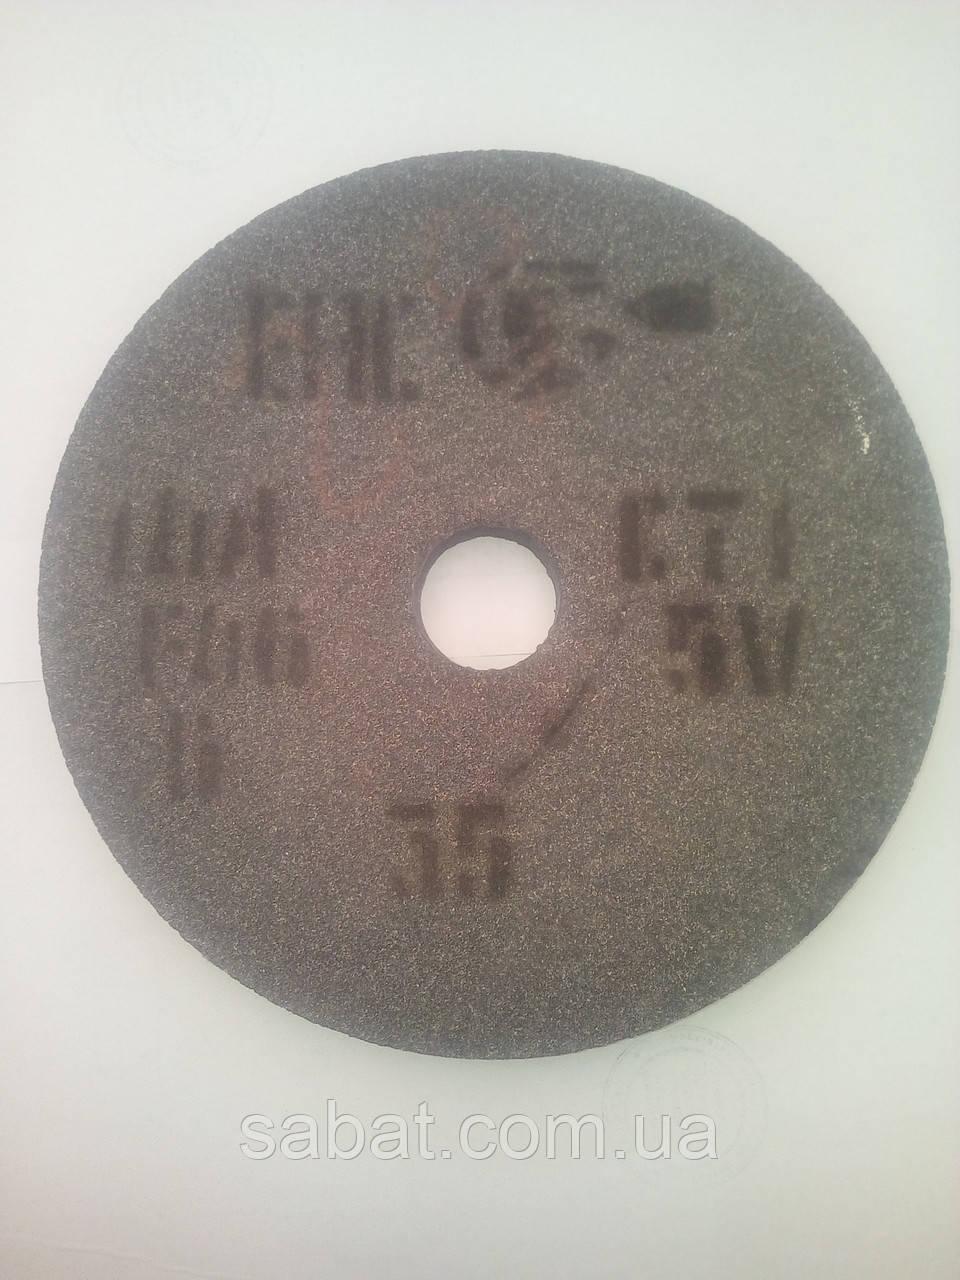 Круг шлифовальный 14А F46-80 СТ-СМ 250х32х32